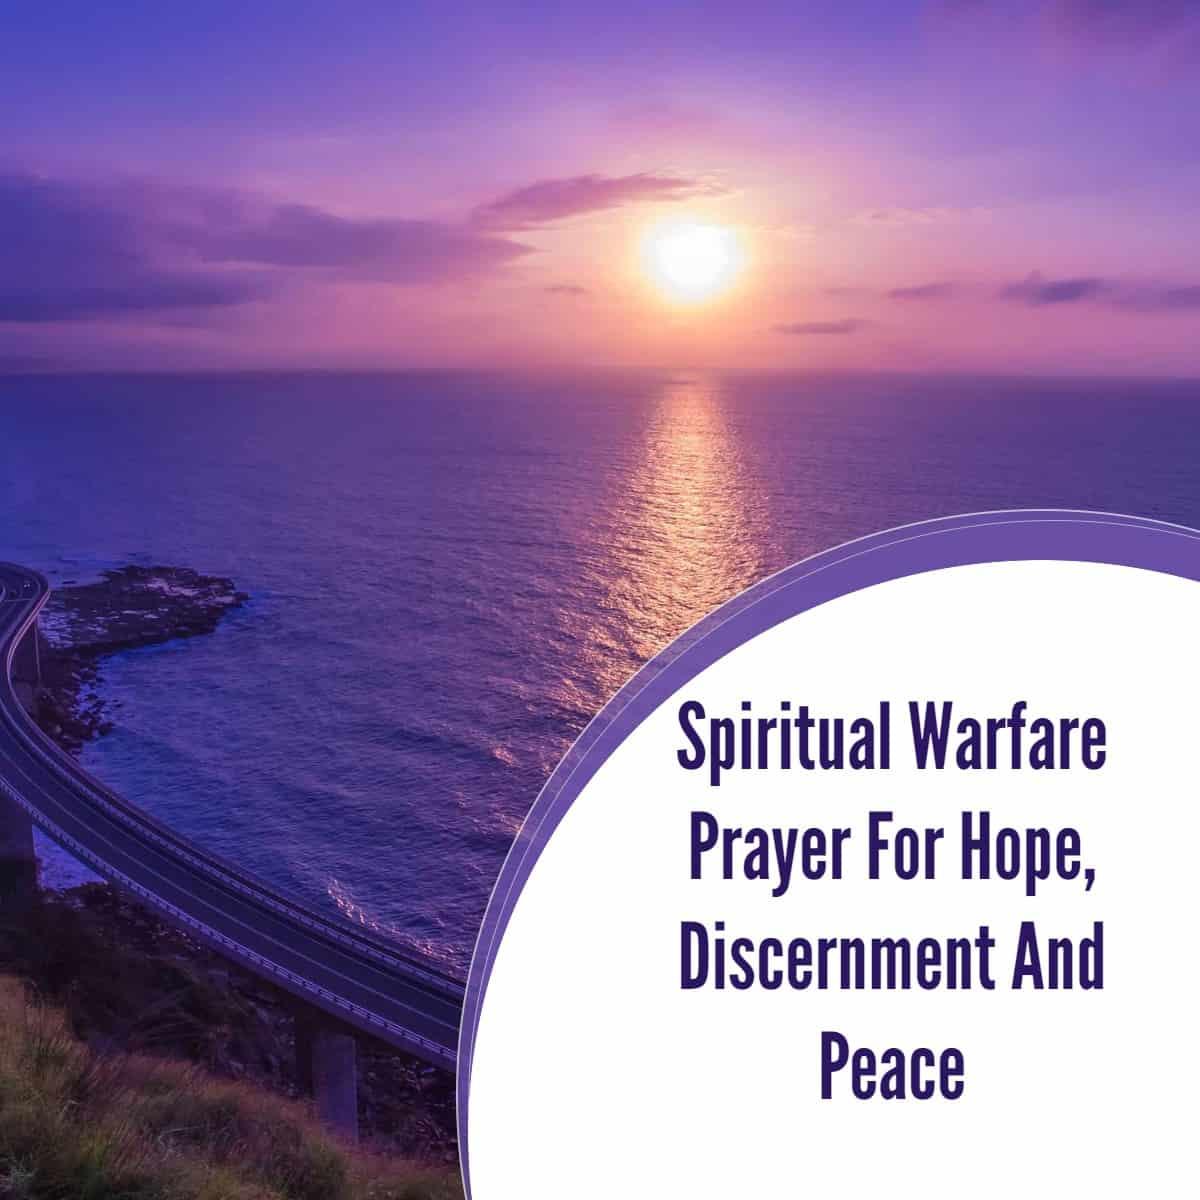 Spiritual Warfare Prayer for Hope, Discernment and Peace